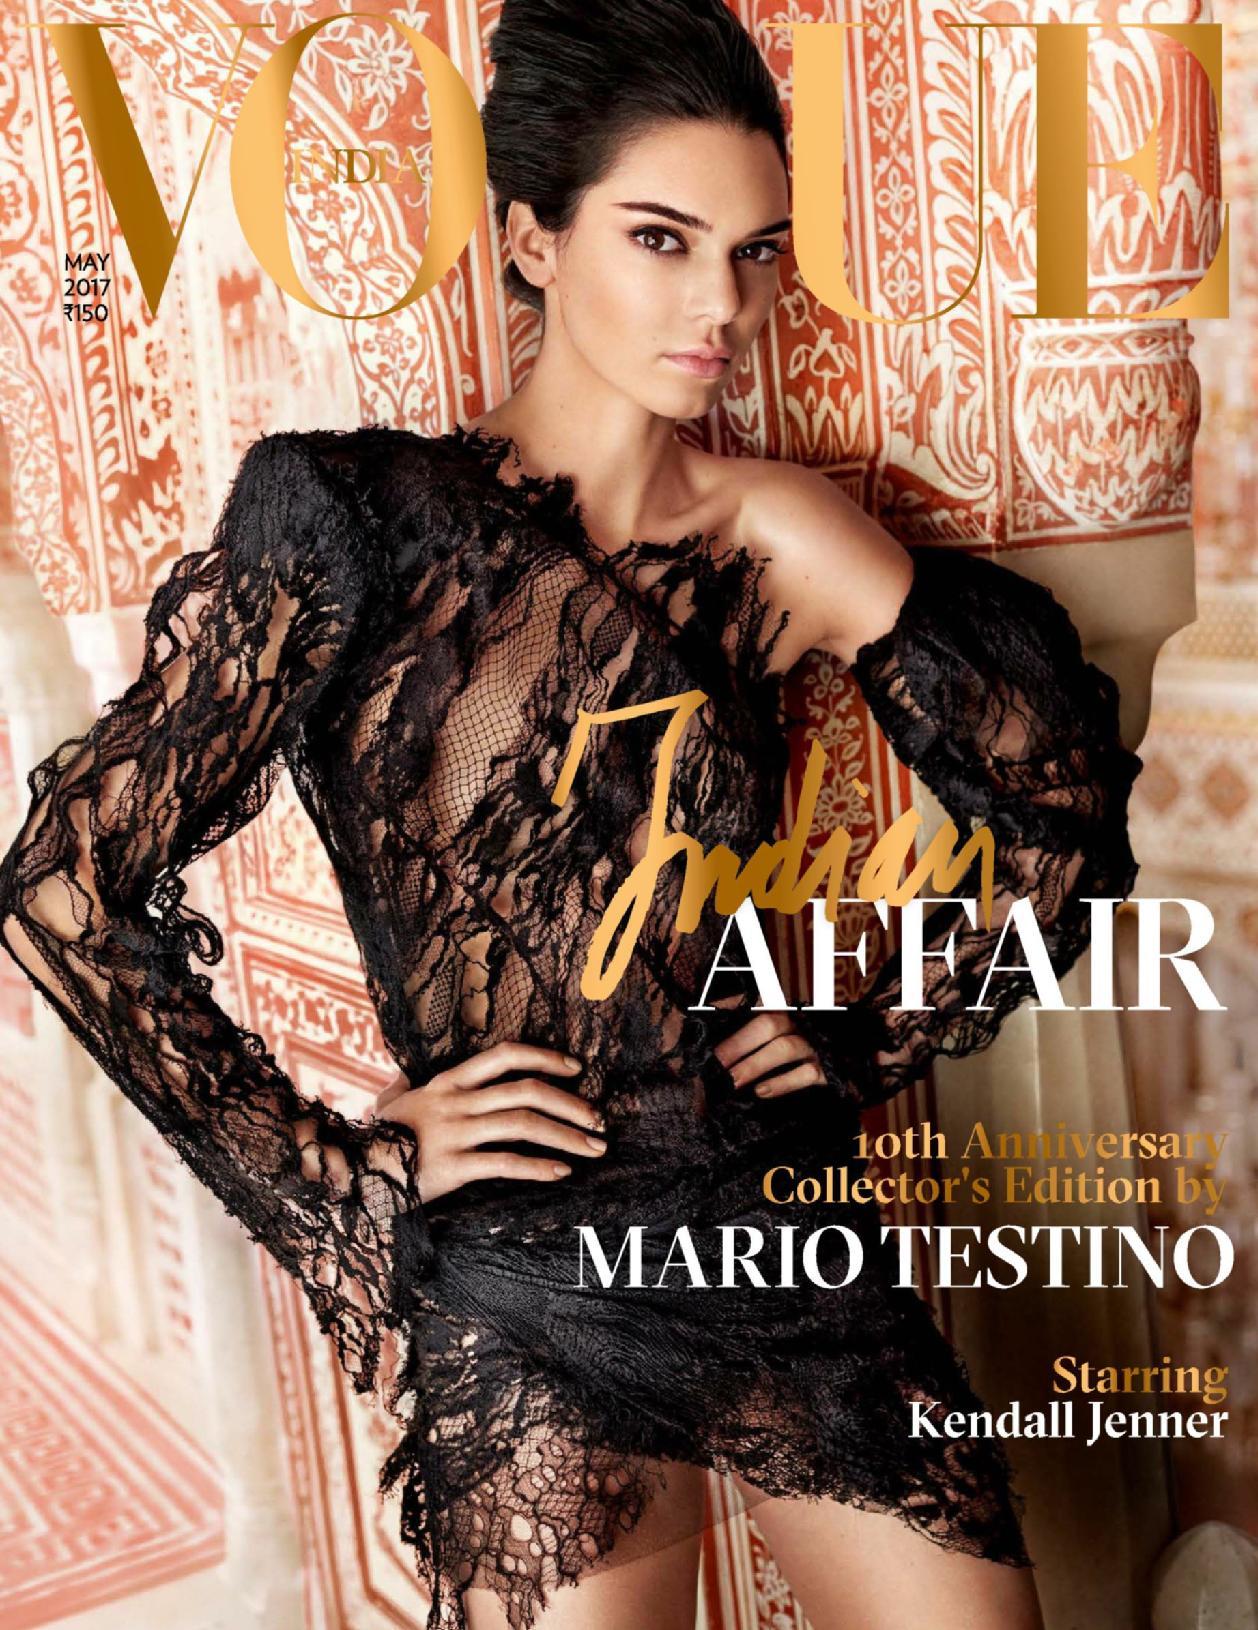 Cover - Vogue India - 09.05.17